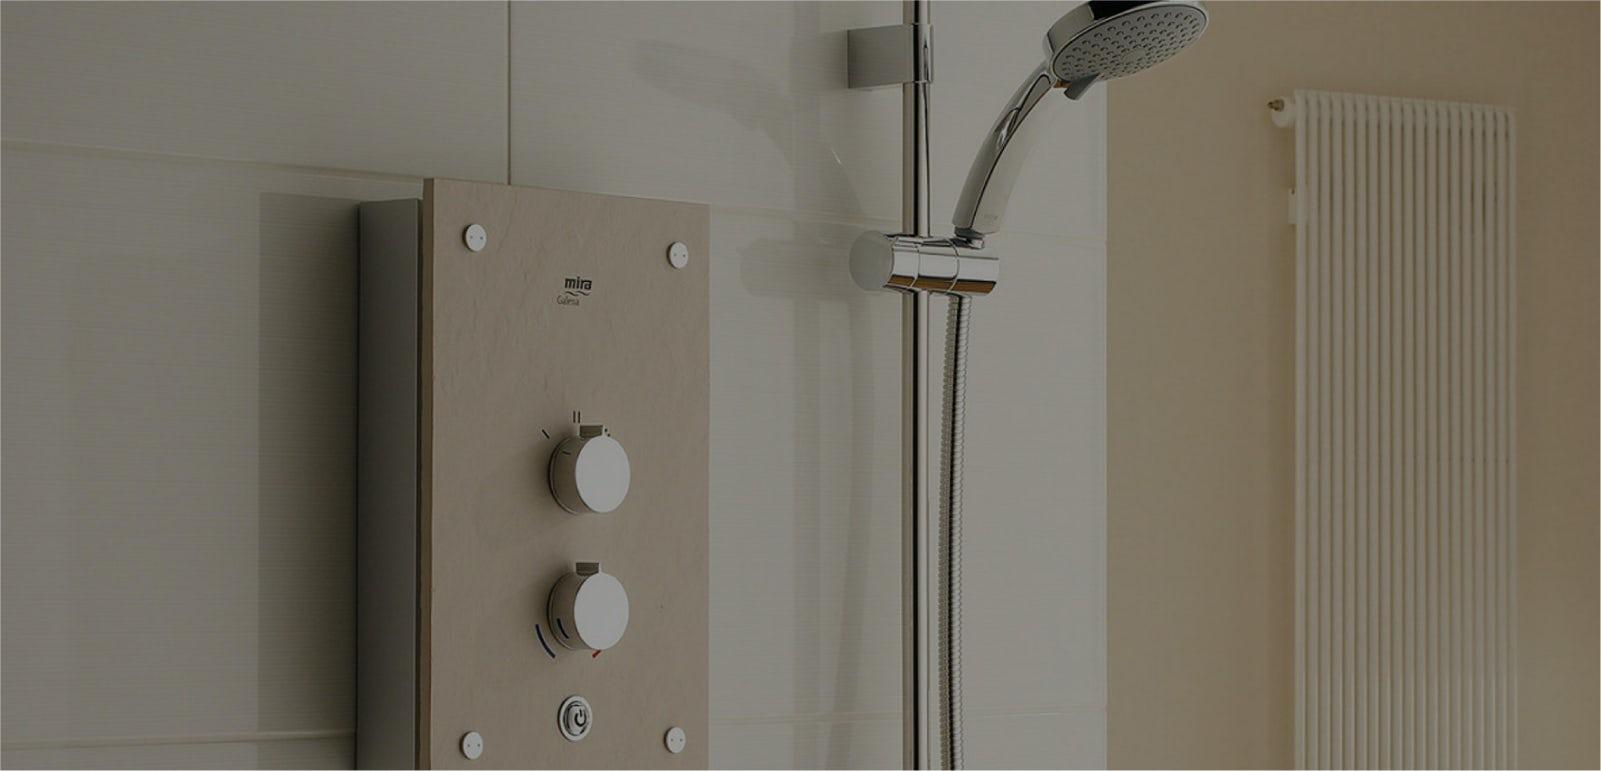 New Shower Friend Constant Water When Showering